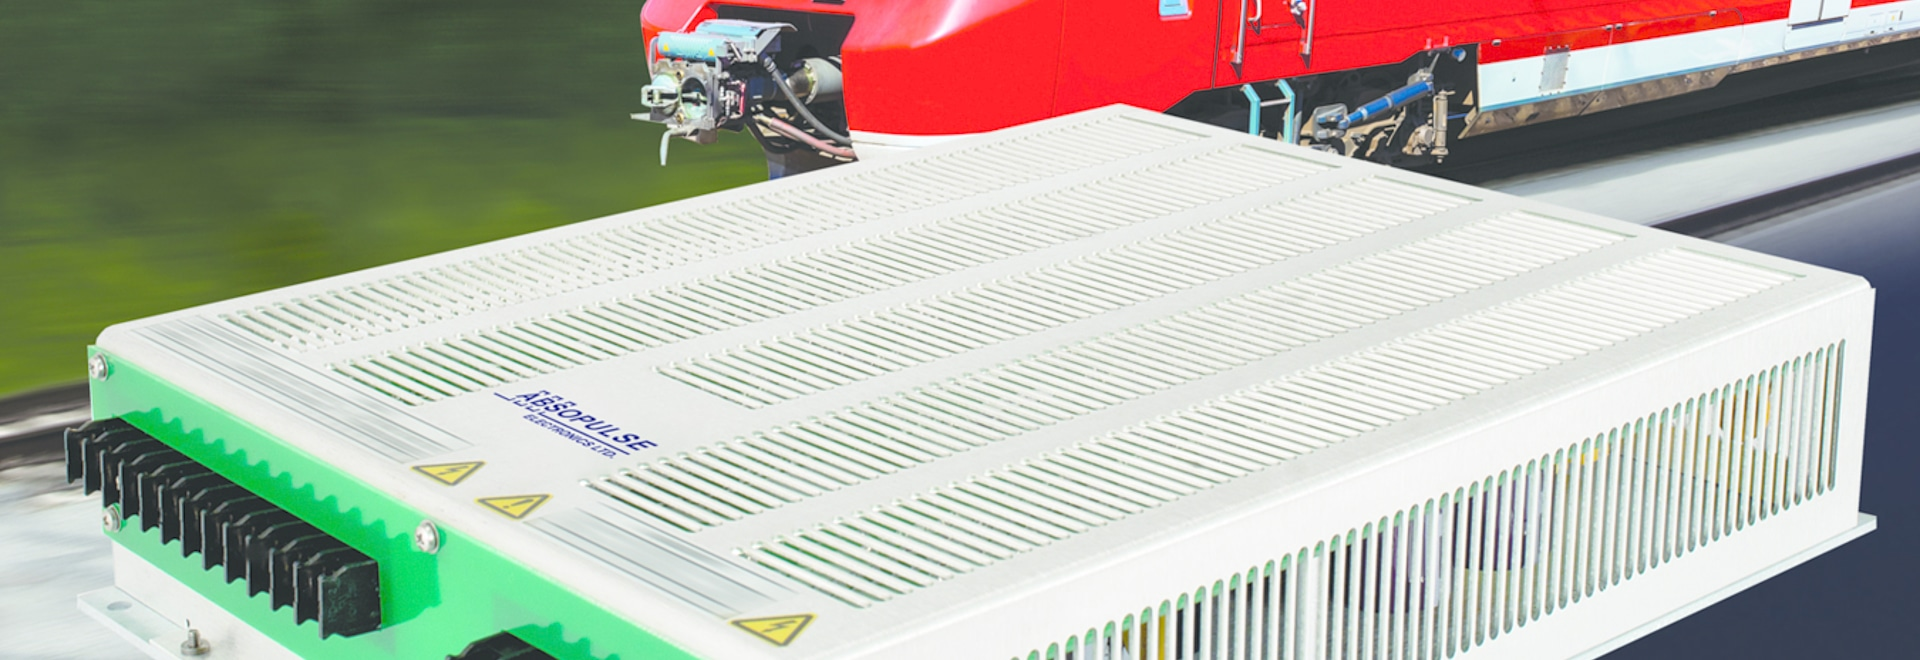 300VA Railway DC-AC inverters deliver 3-phase pure sine wave output voltage